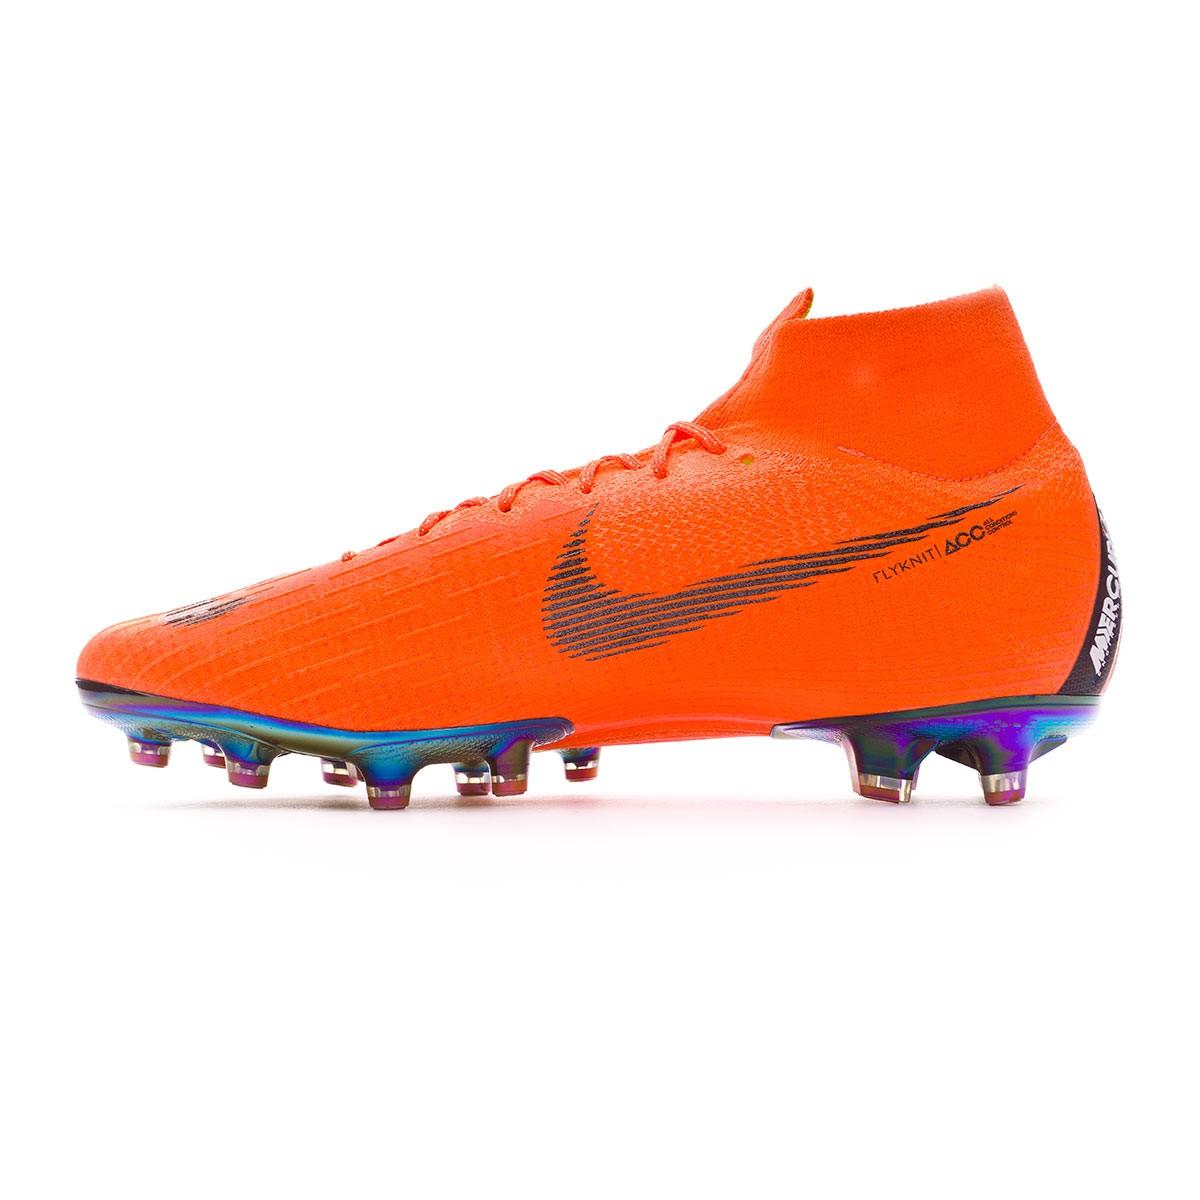 493174256744a Chuteira Nike Mercurial Superfly VI Elite AG-Pro Total orange-Black-Volt -  Loja de futebol Fútbol Emotion